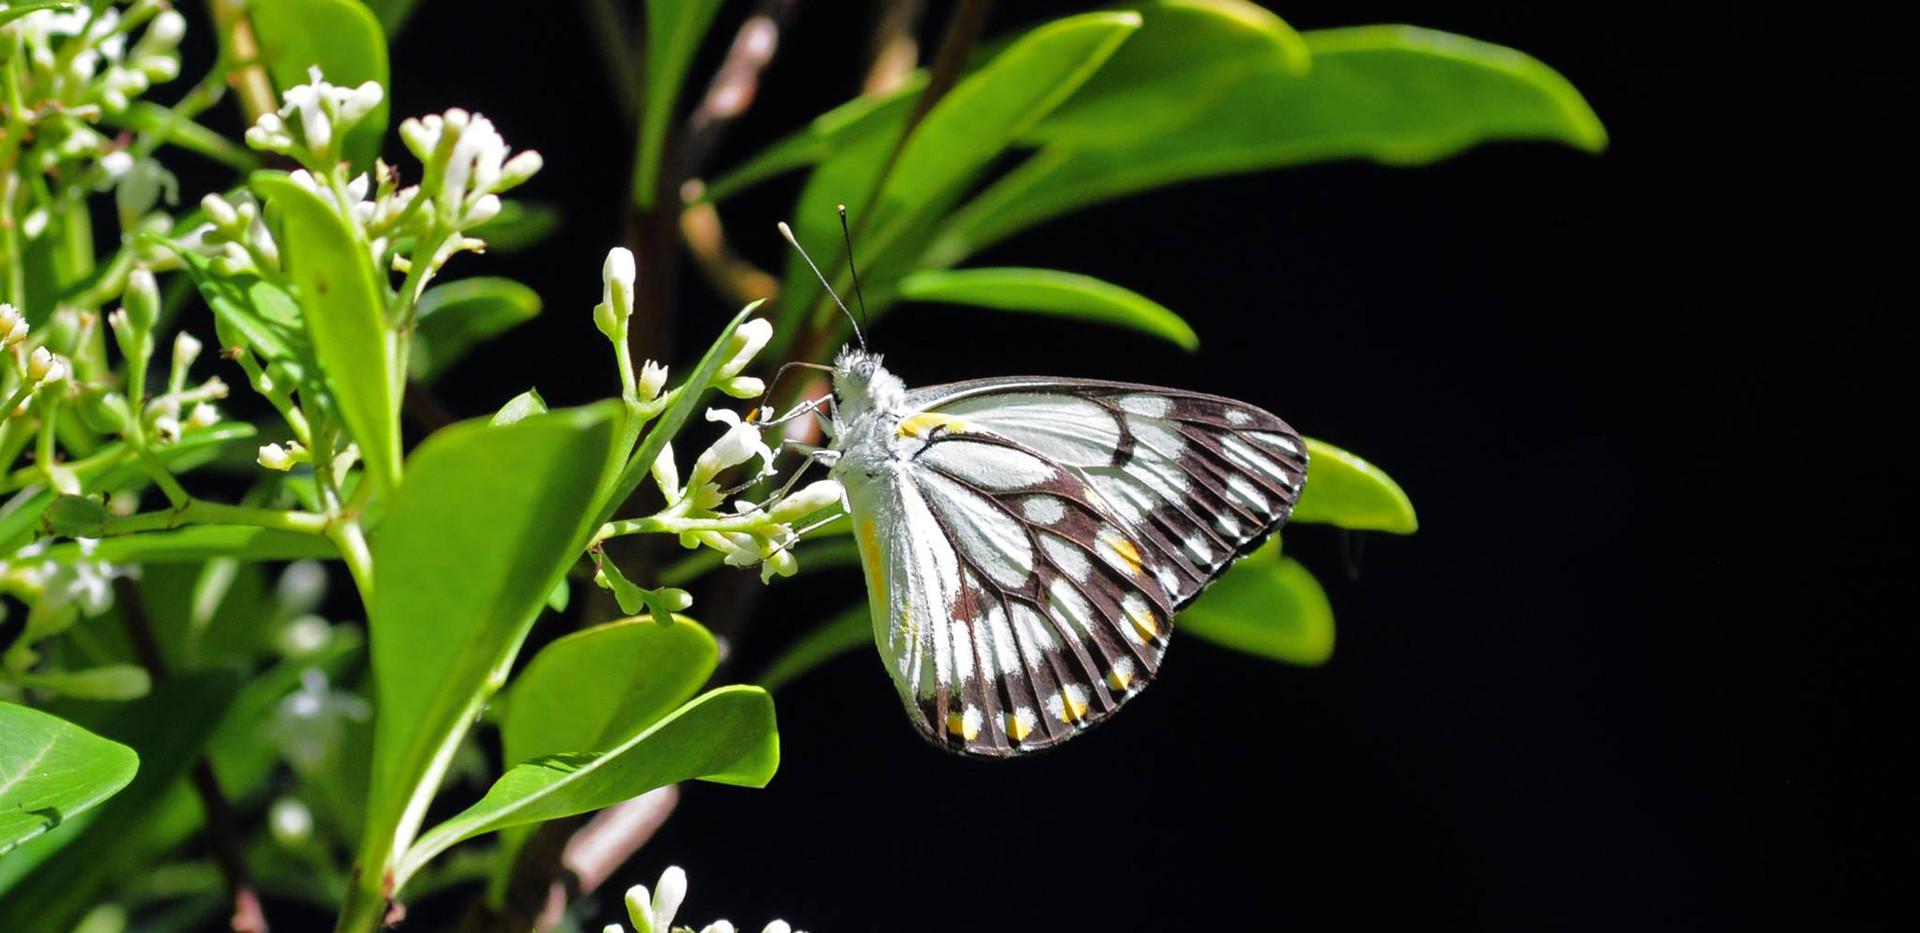 Caper White Butterfly - Male